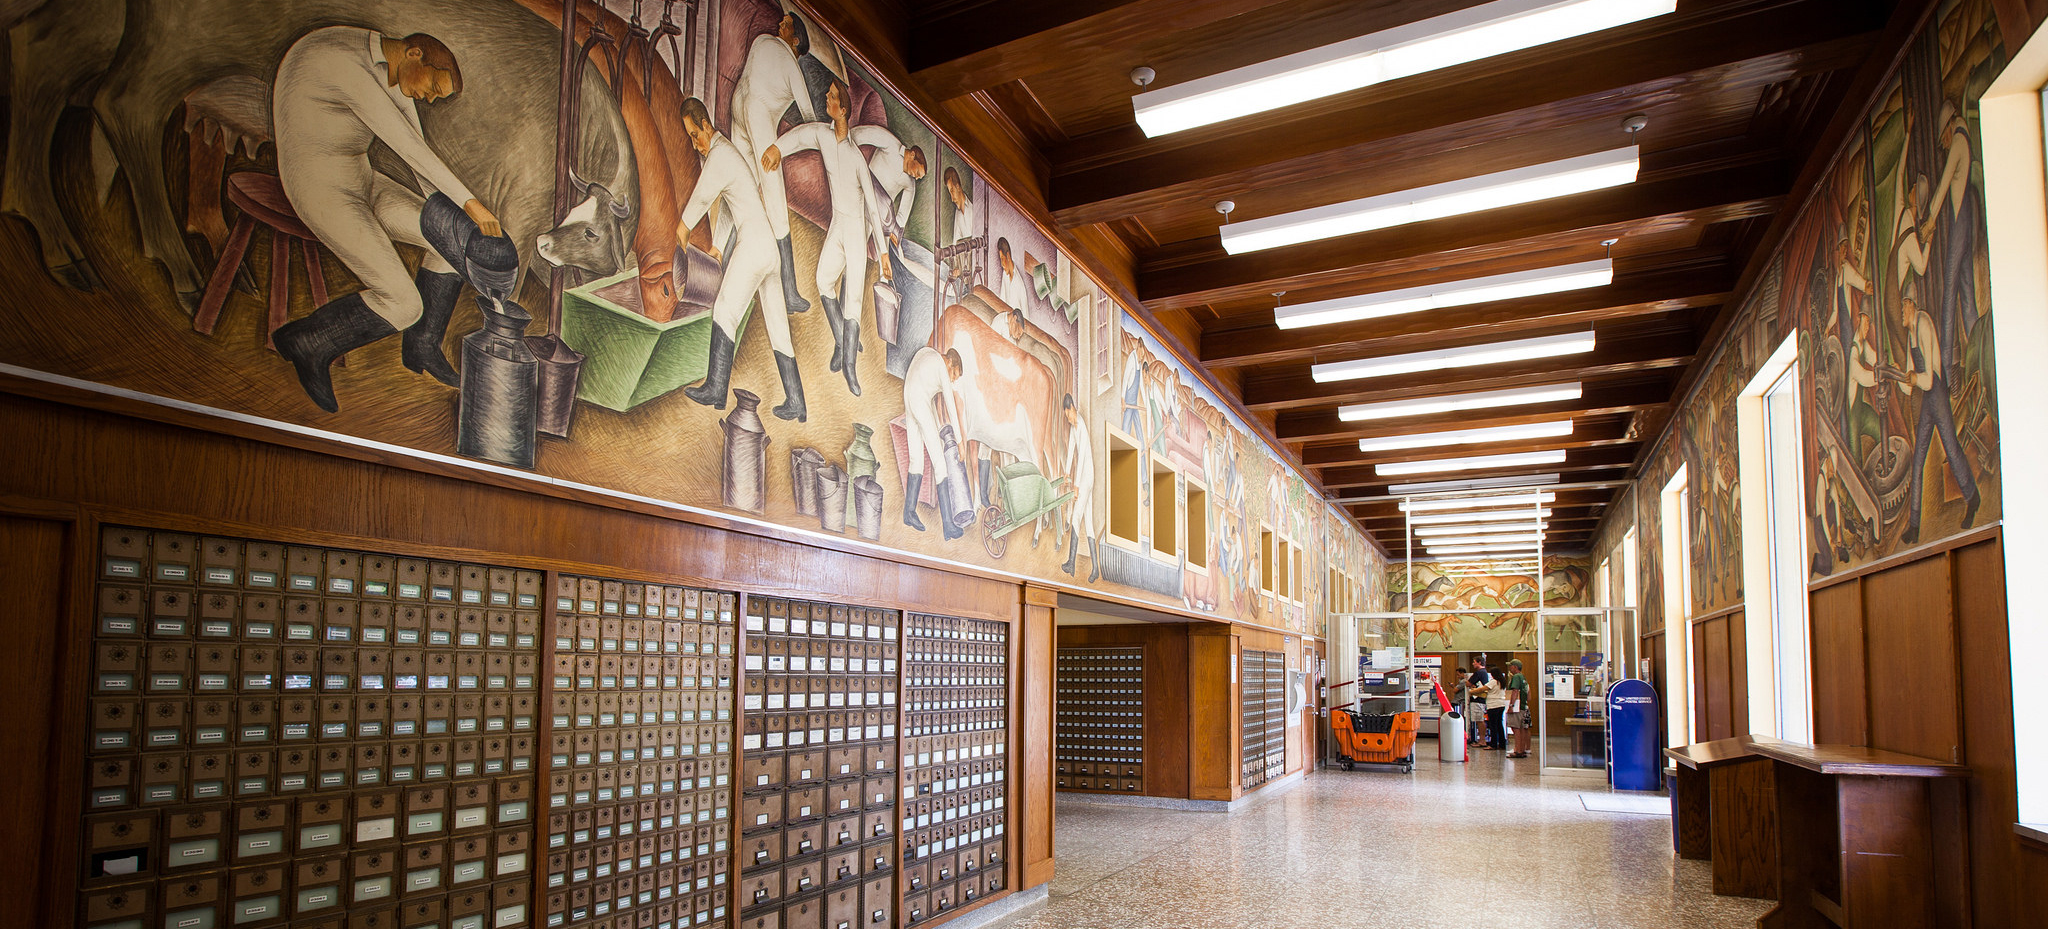 Ventura-post-office-mural-Gordon-K-Grant-2